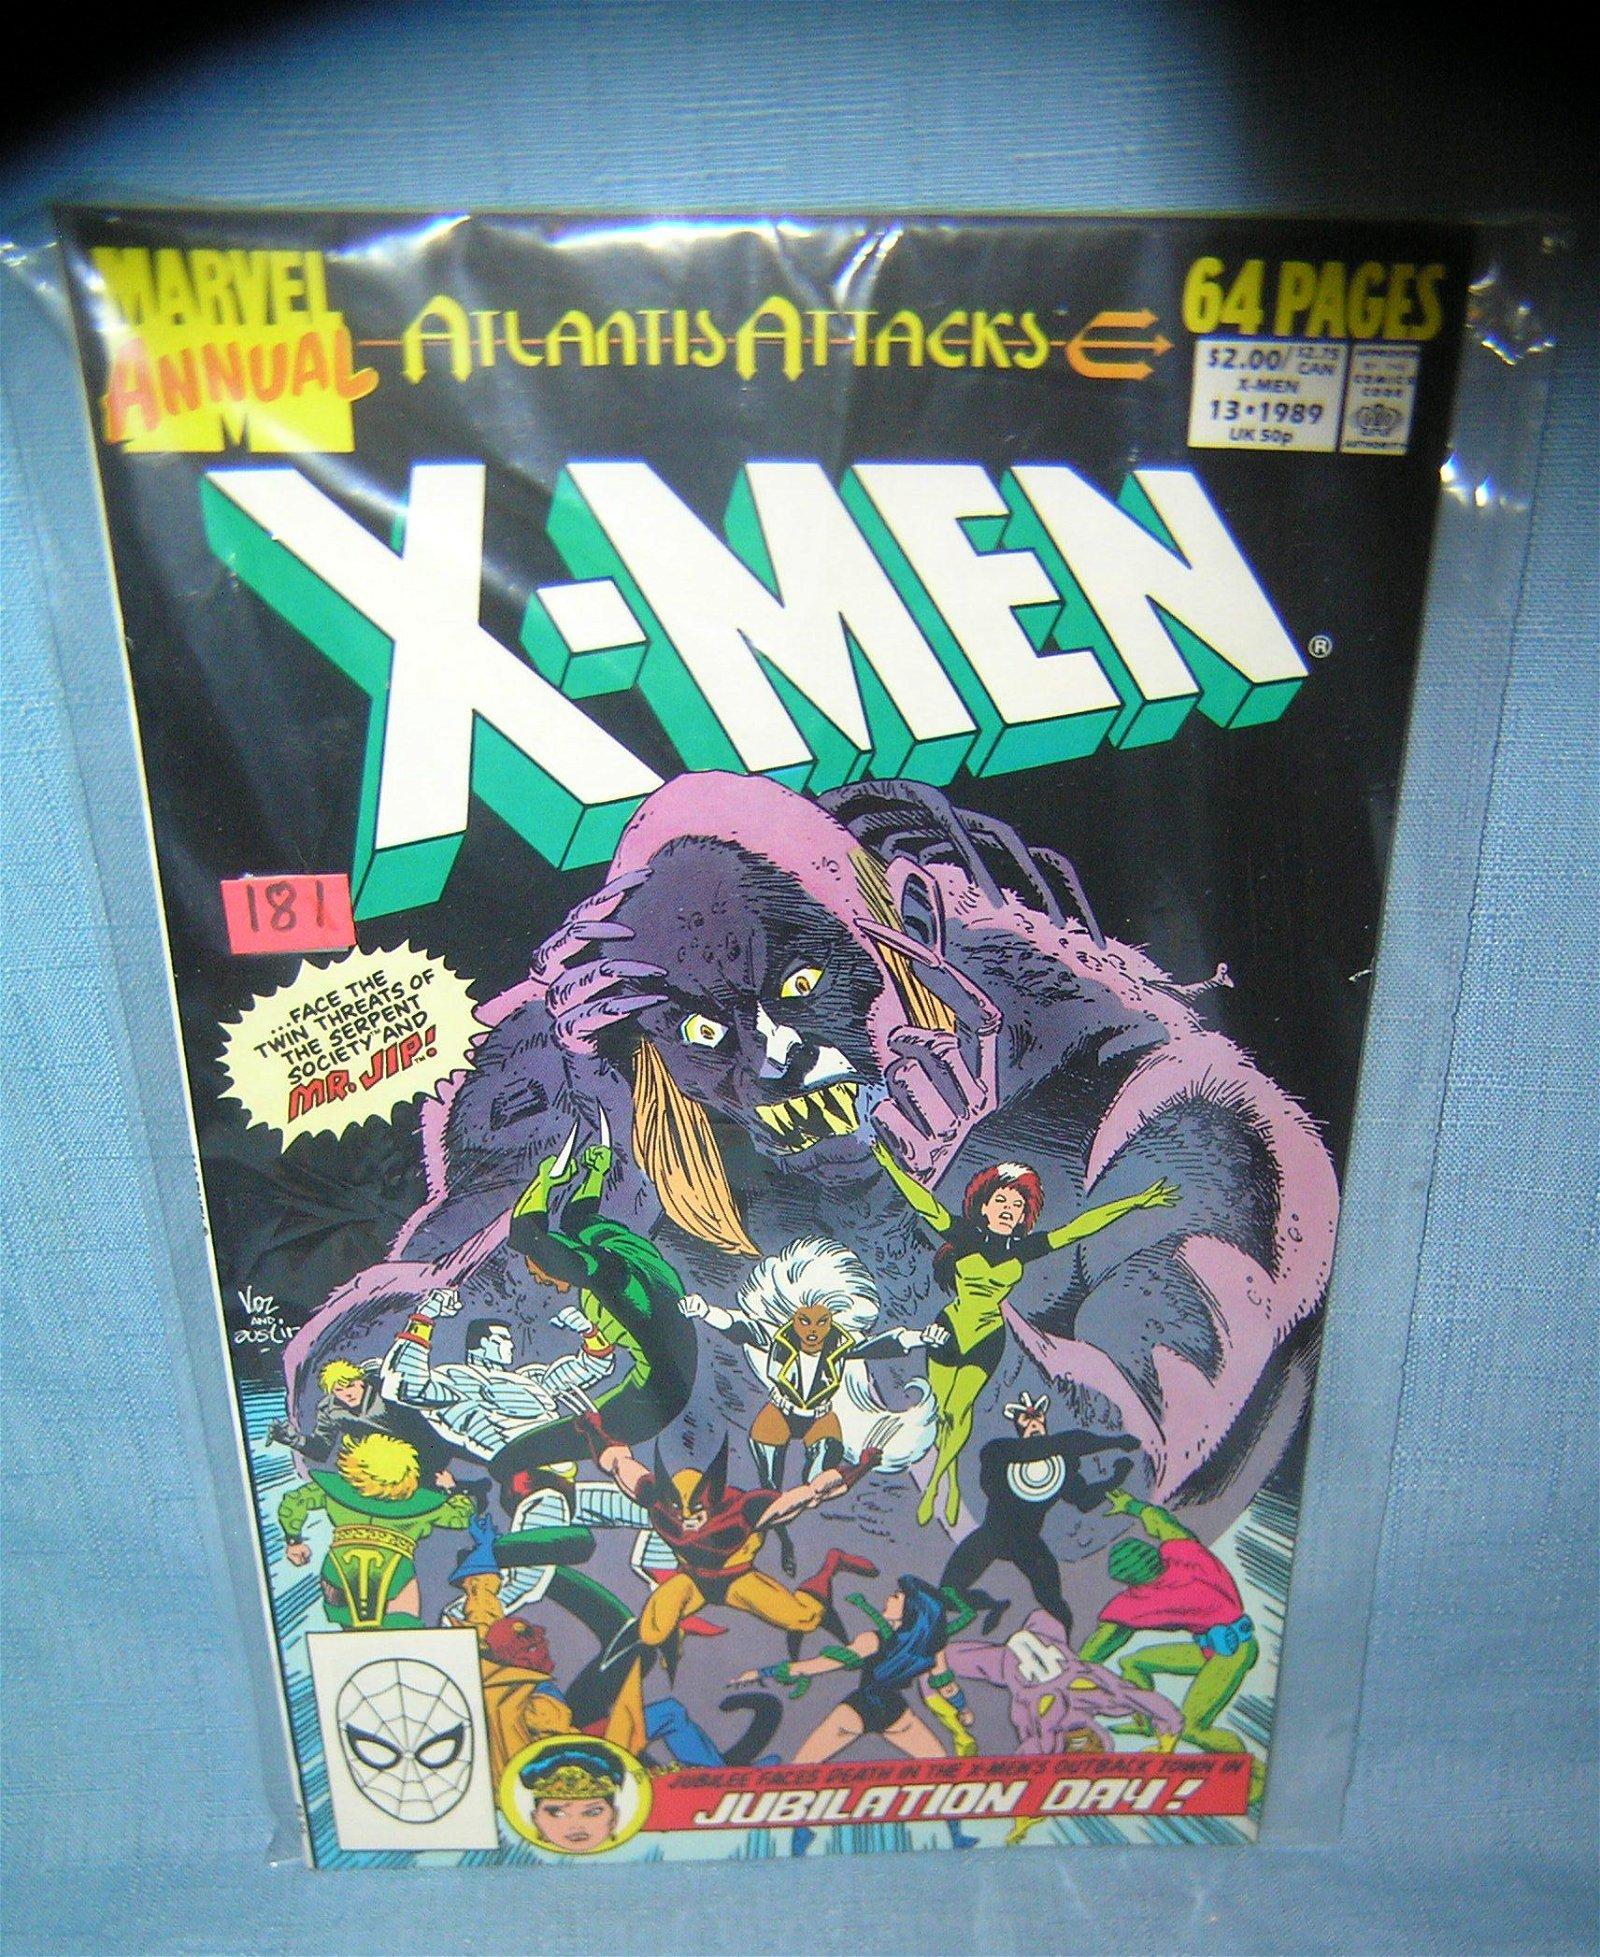 Vintage Xmen oversized comic book